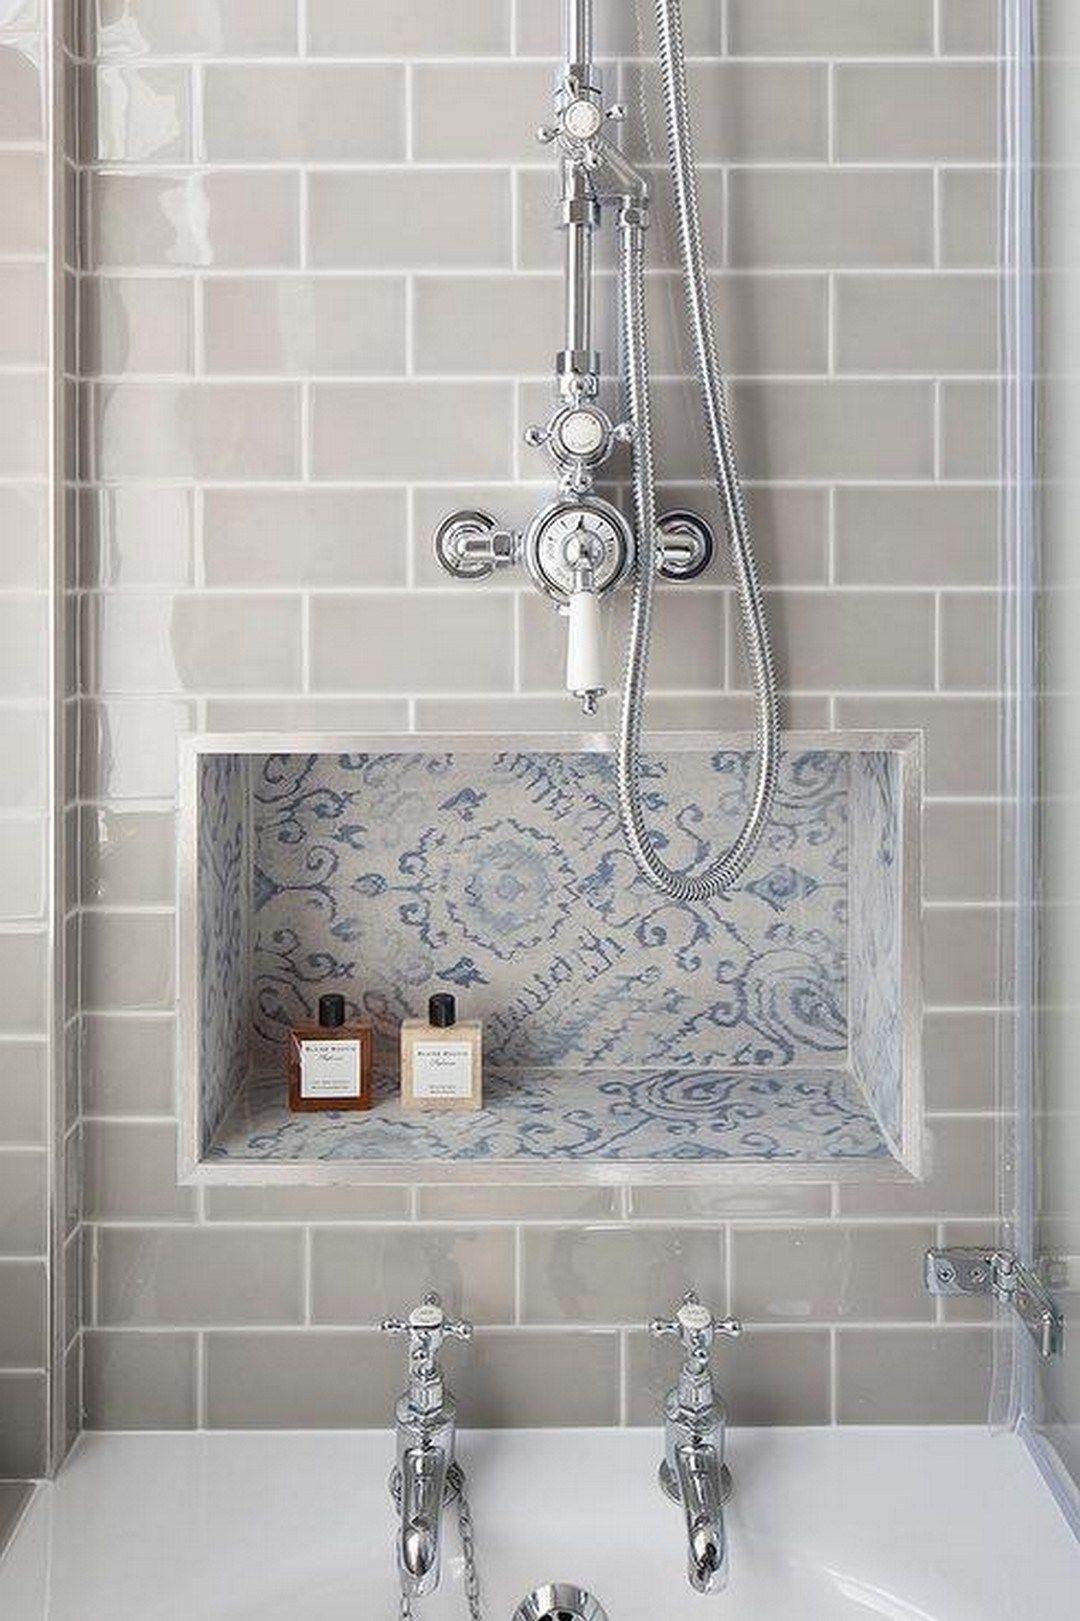 Bathroom Subway Tile Design 99 New Trends Bathroom Tile Design Inspiration 2017 12  Atlanta